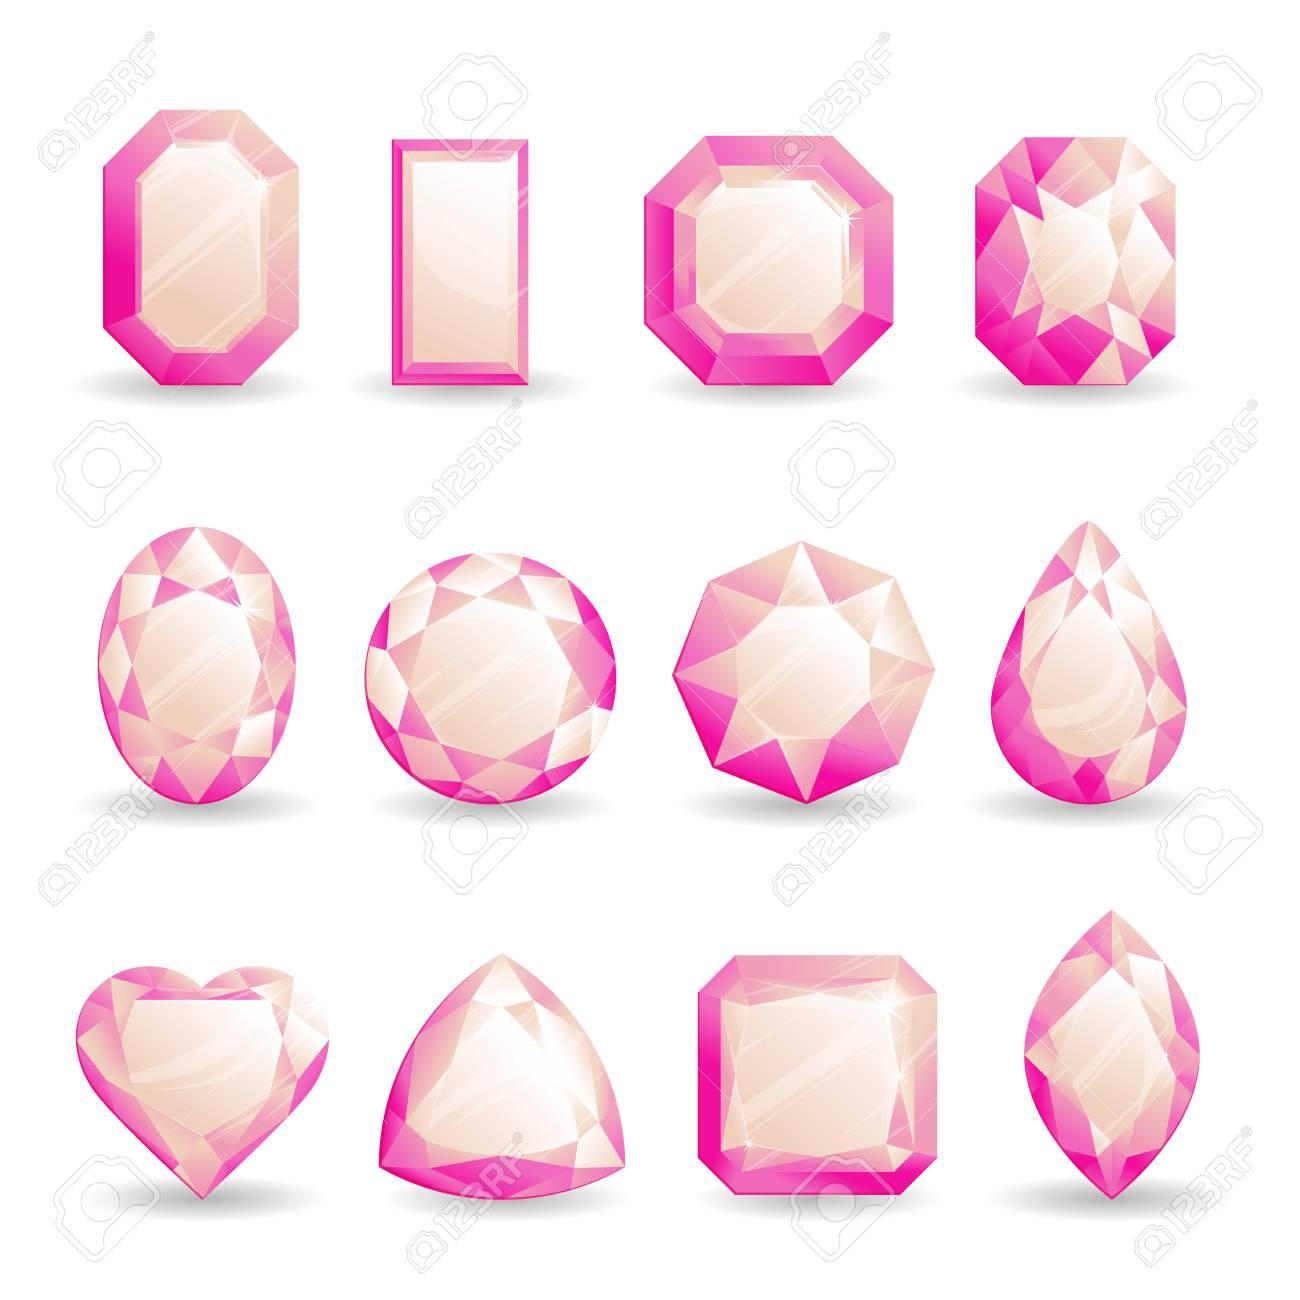 Set of Pink Tourmaline Crystals